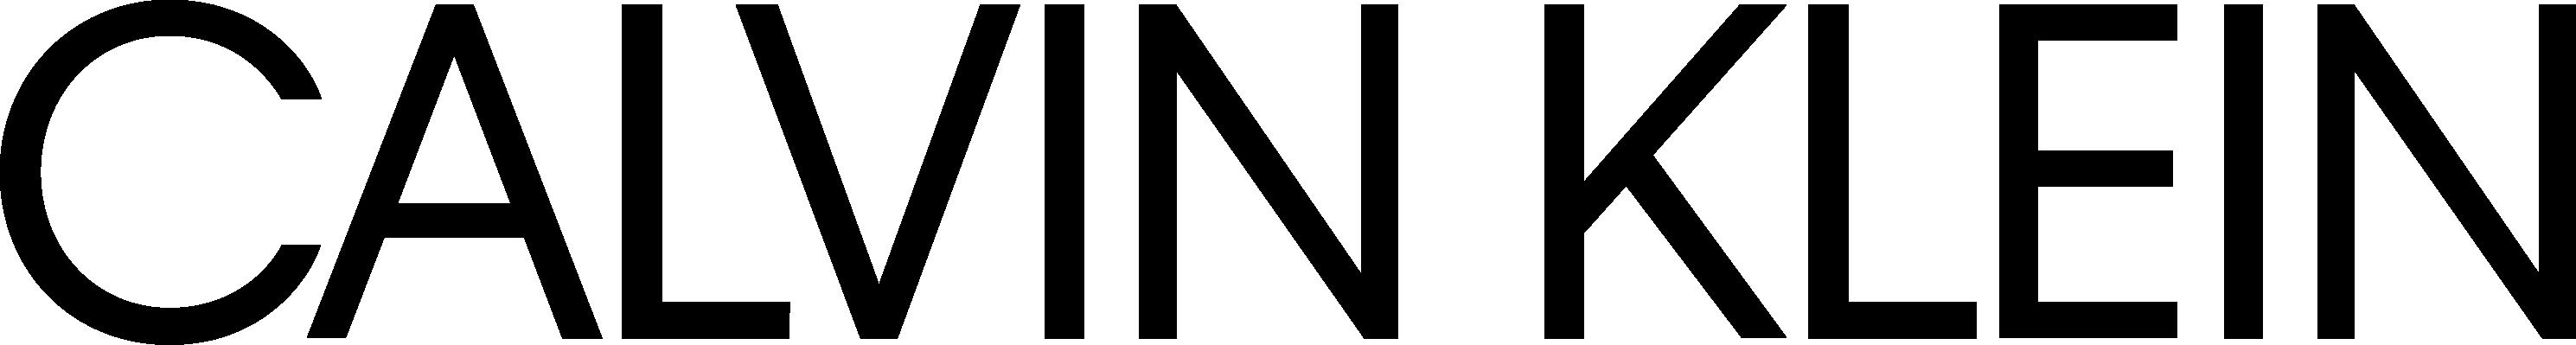 Calvin Klein logo PNG images free download.